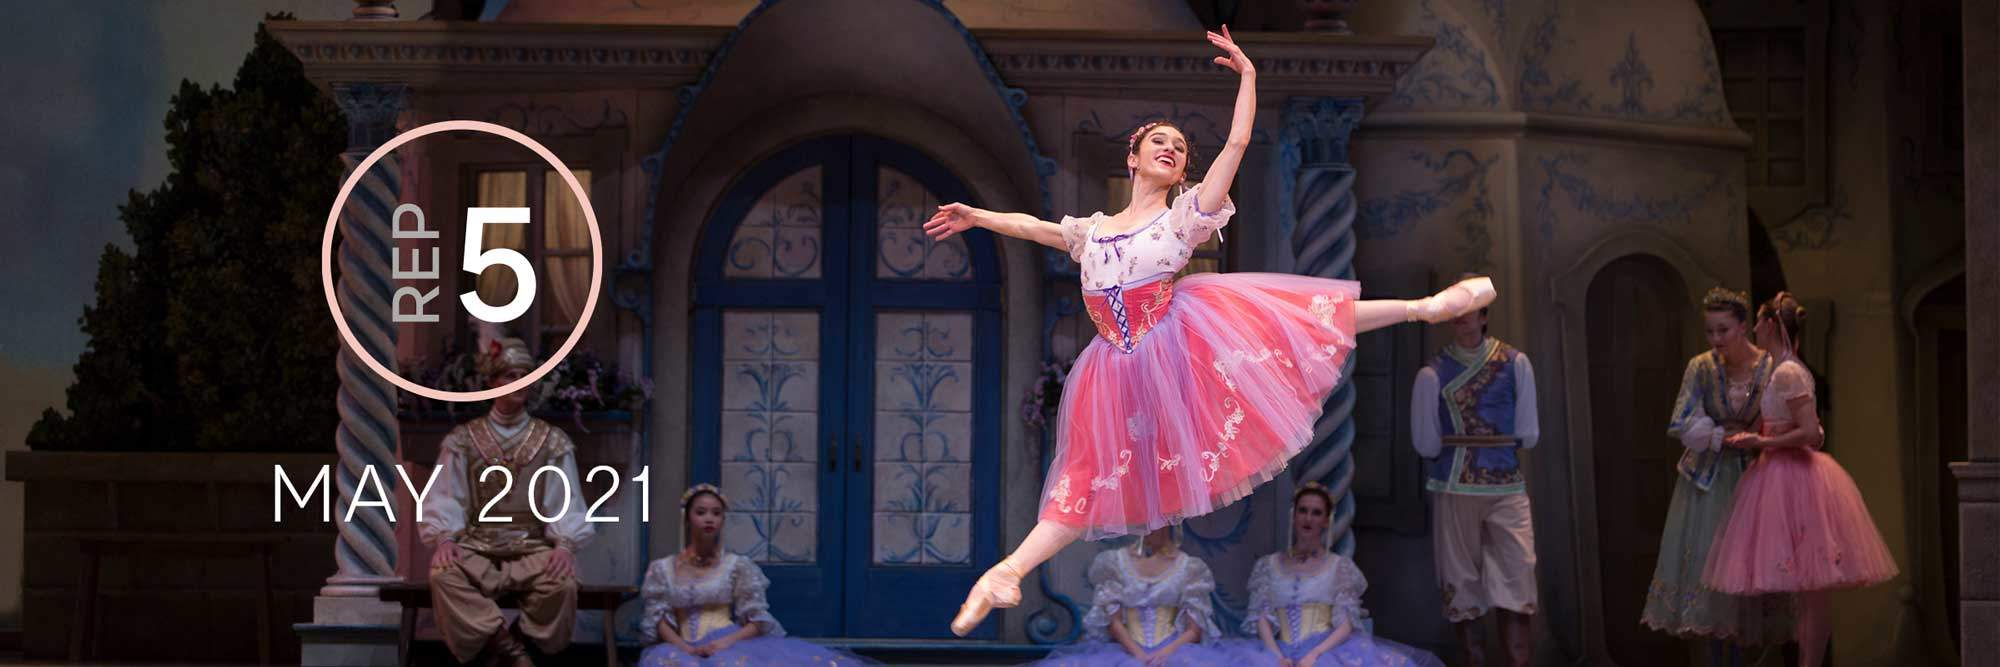 Rep 5, May 2021: Leta Biasucci dancing in Alexandra Danilova and George Balanchine's Coppelia.